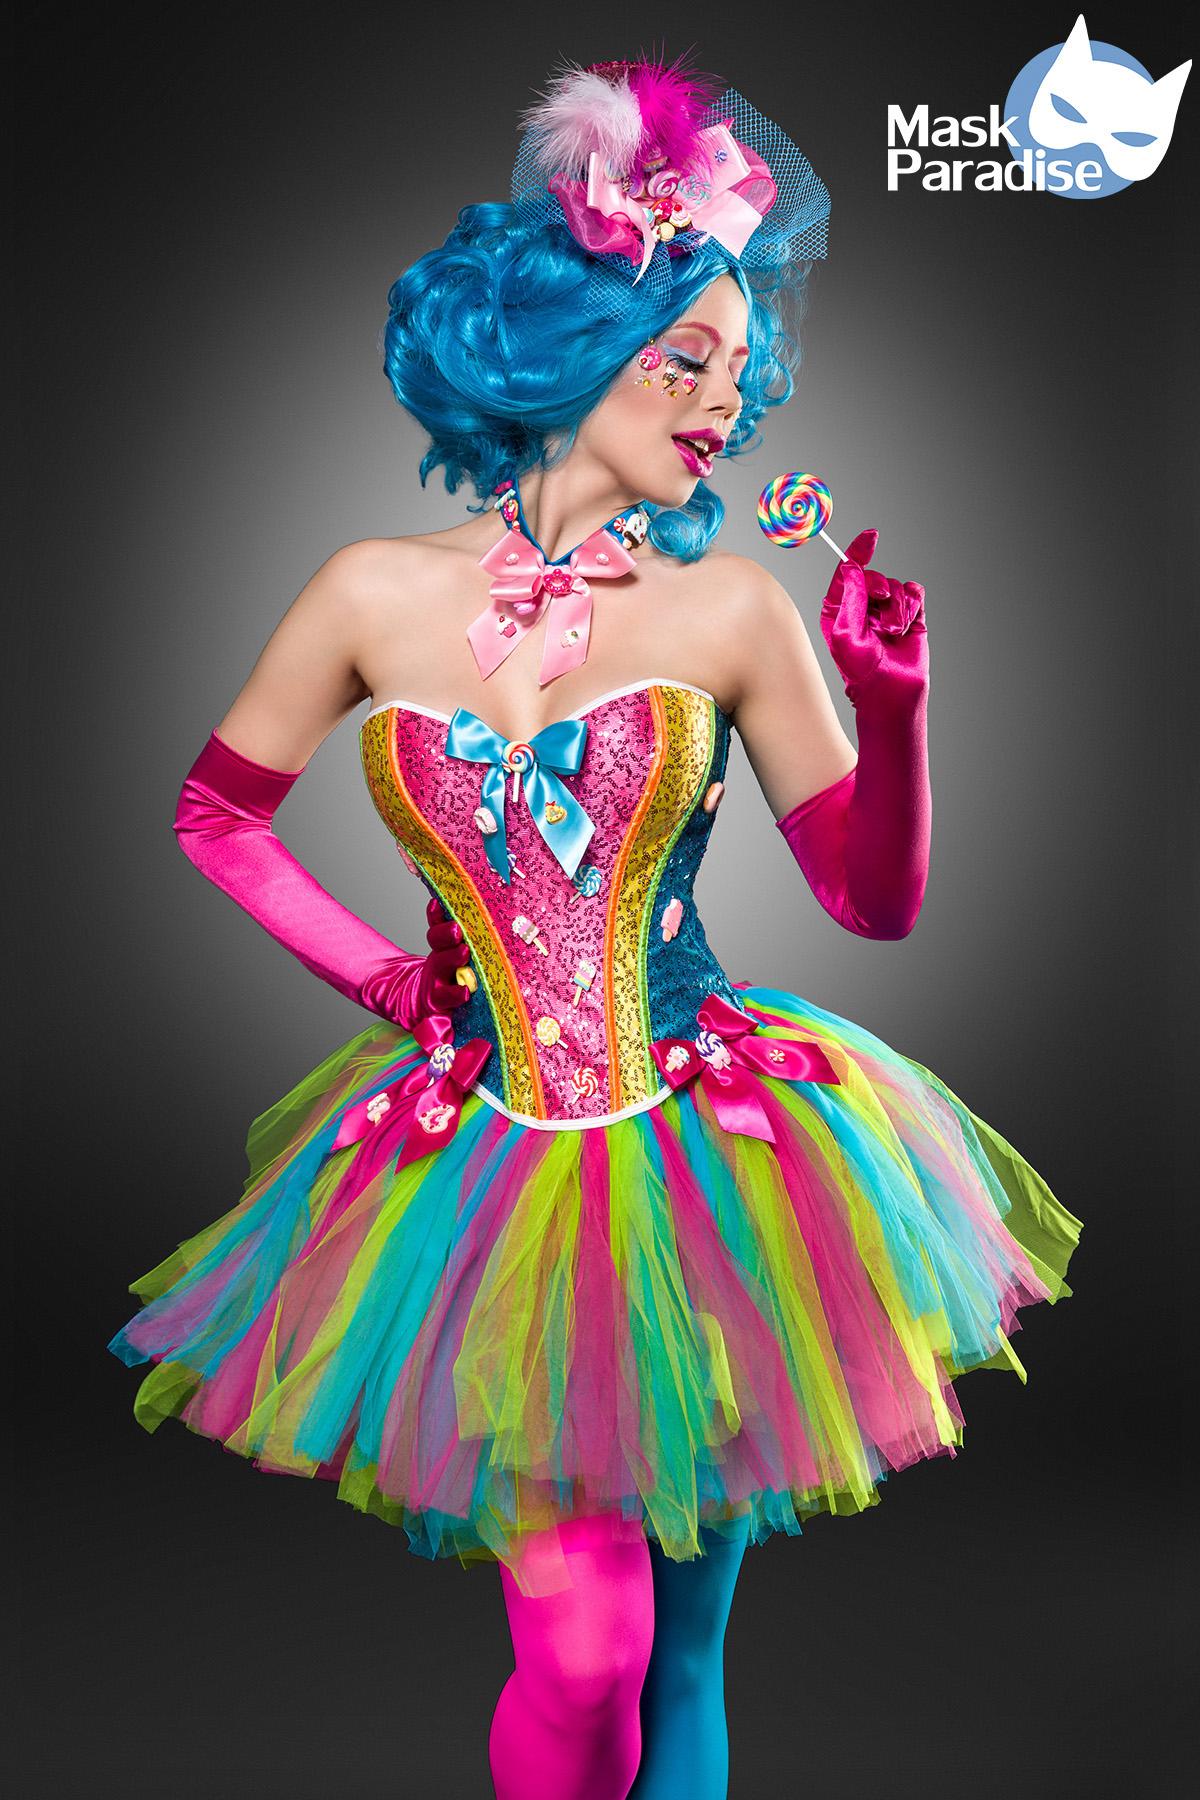 CANDY GIRL Verspieltes Candy Costume Sweet Girl COLOREE costume mardi mardi mardi gras carnaval 4766ea